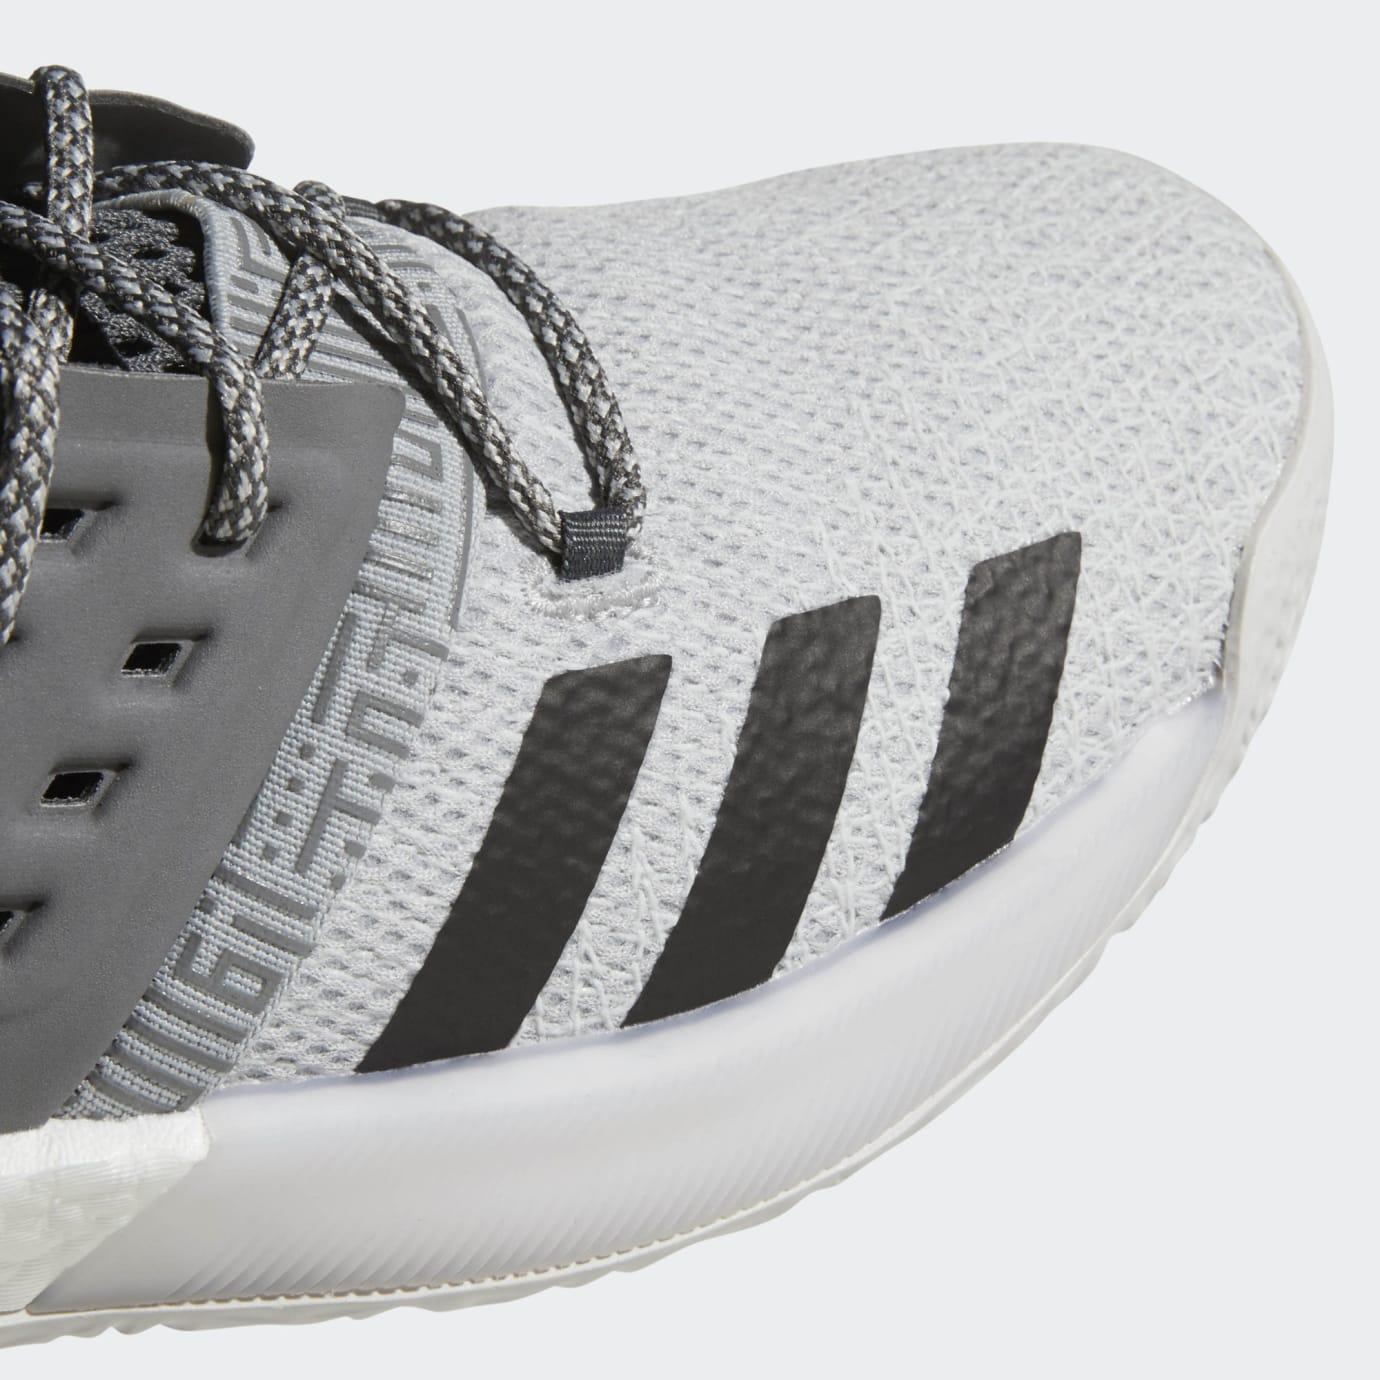 2d07029c49d4 Adidas Harden Vol. 2 Concrete Grey Release Date AH2122 Toe